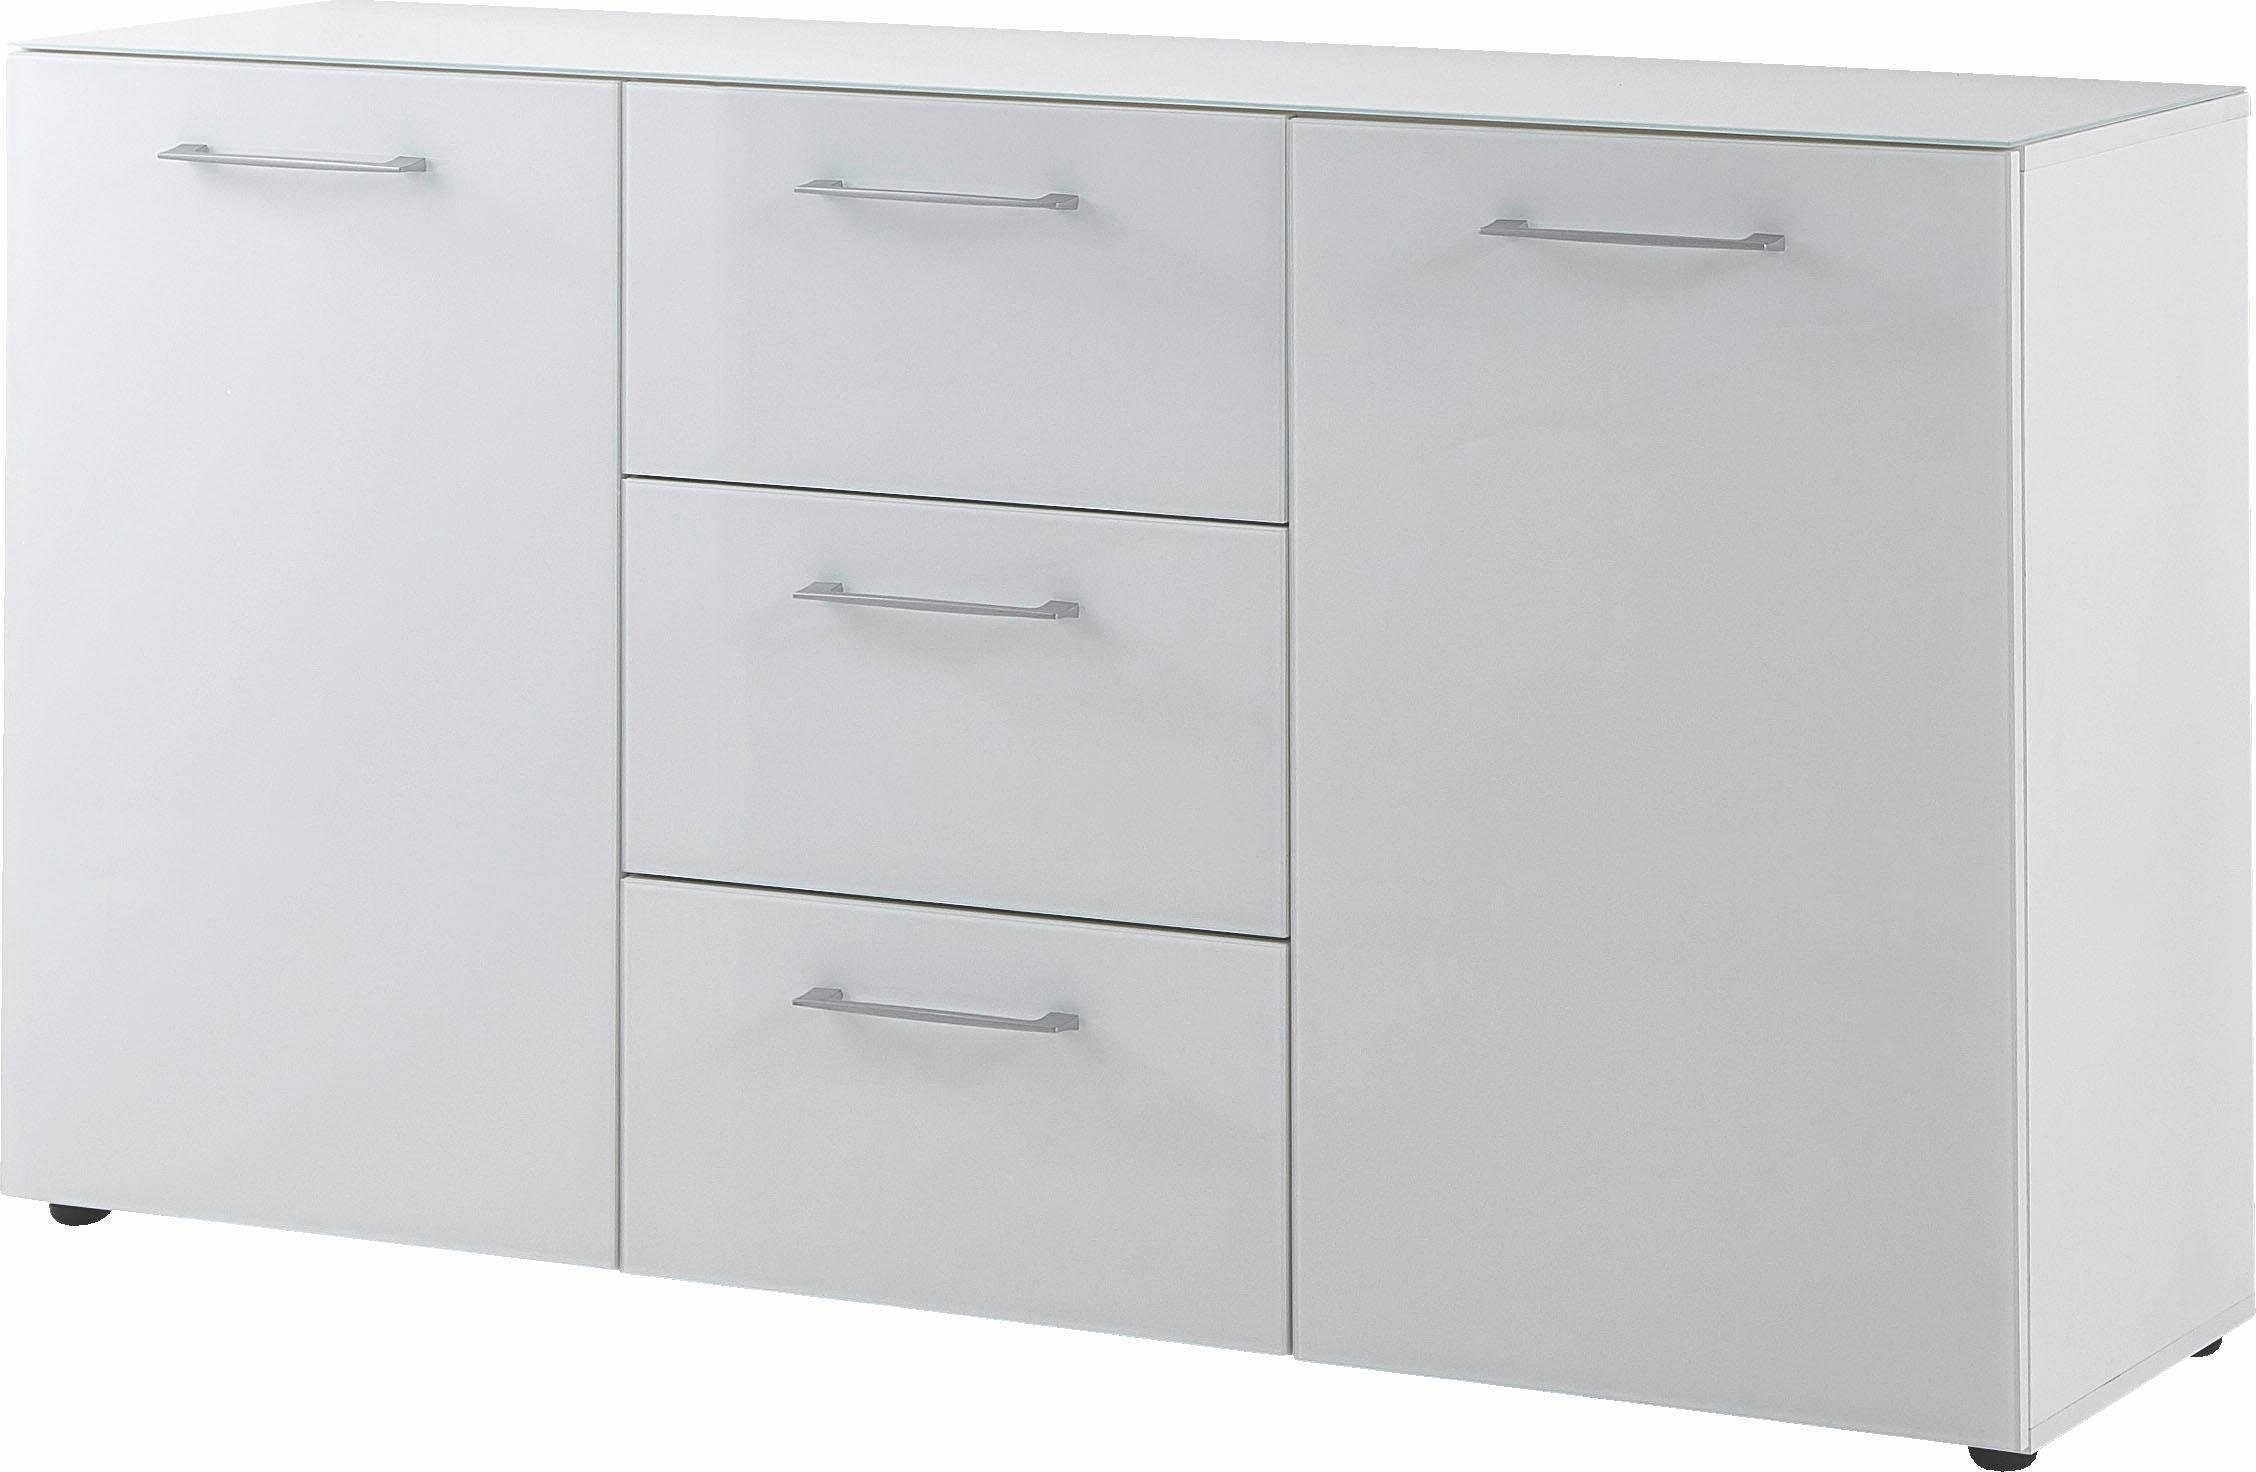 GERMANIA »Scalea« Sideboard, Breite 145 cm